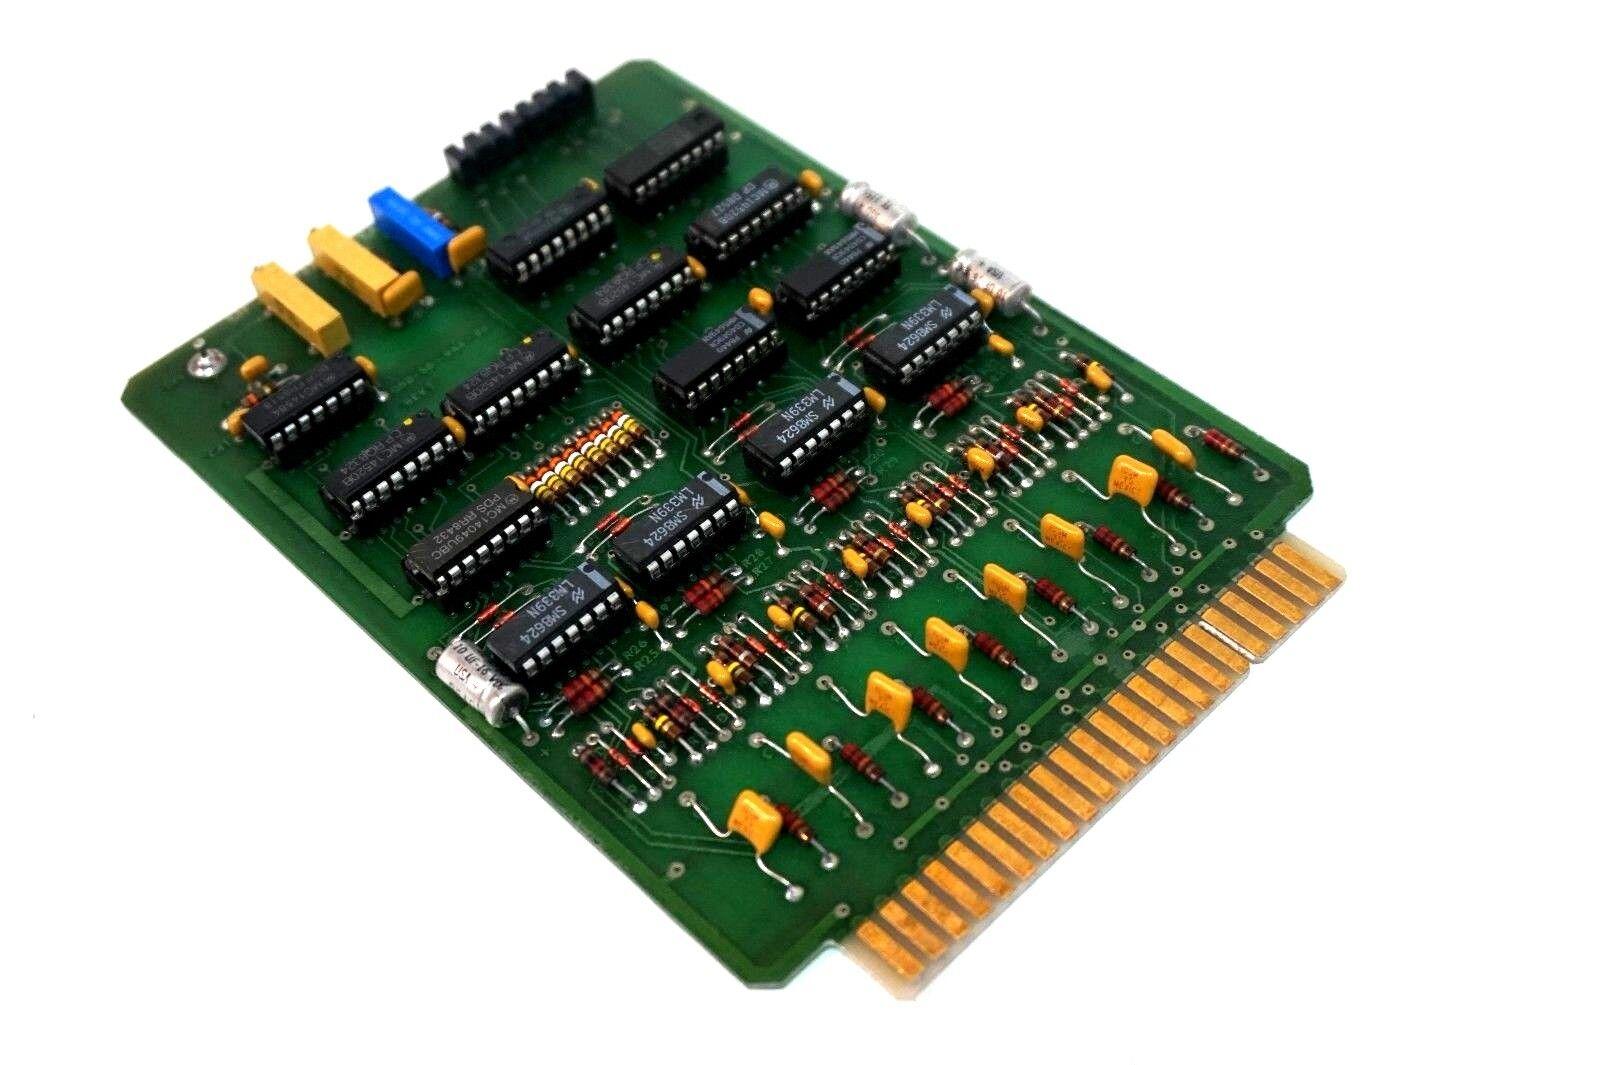 USED OWENS CORNING 08D-50-944-88 PC BOARD REV.1 08D5094488